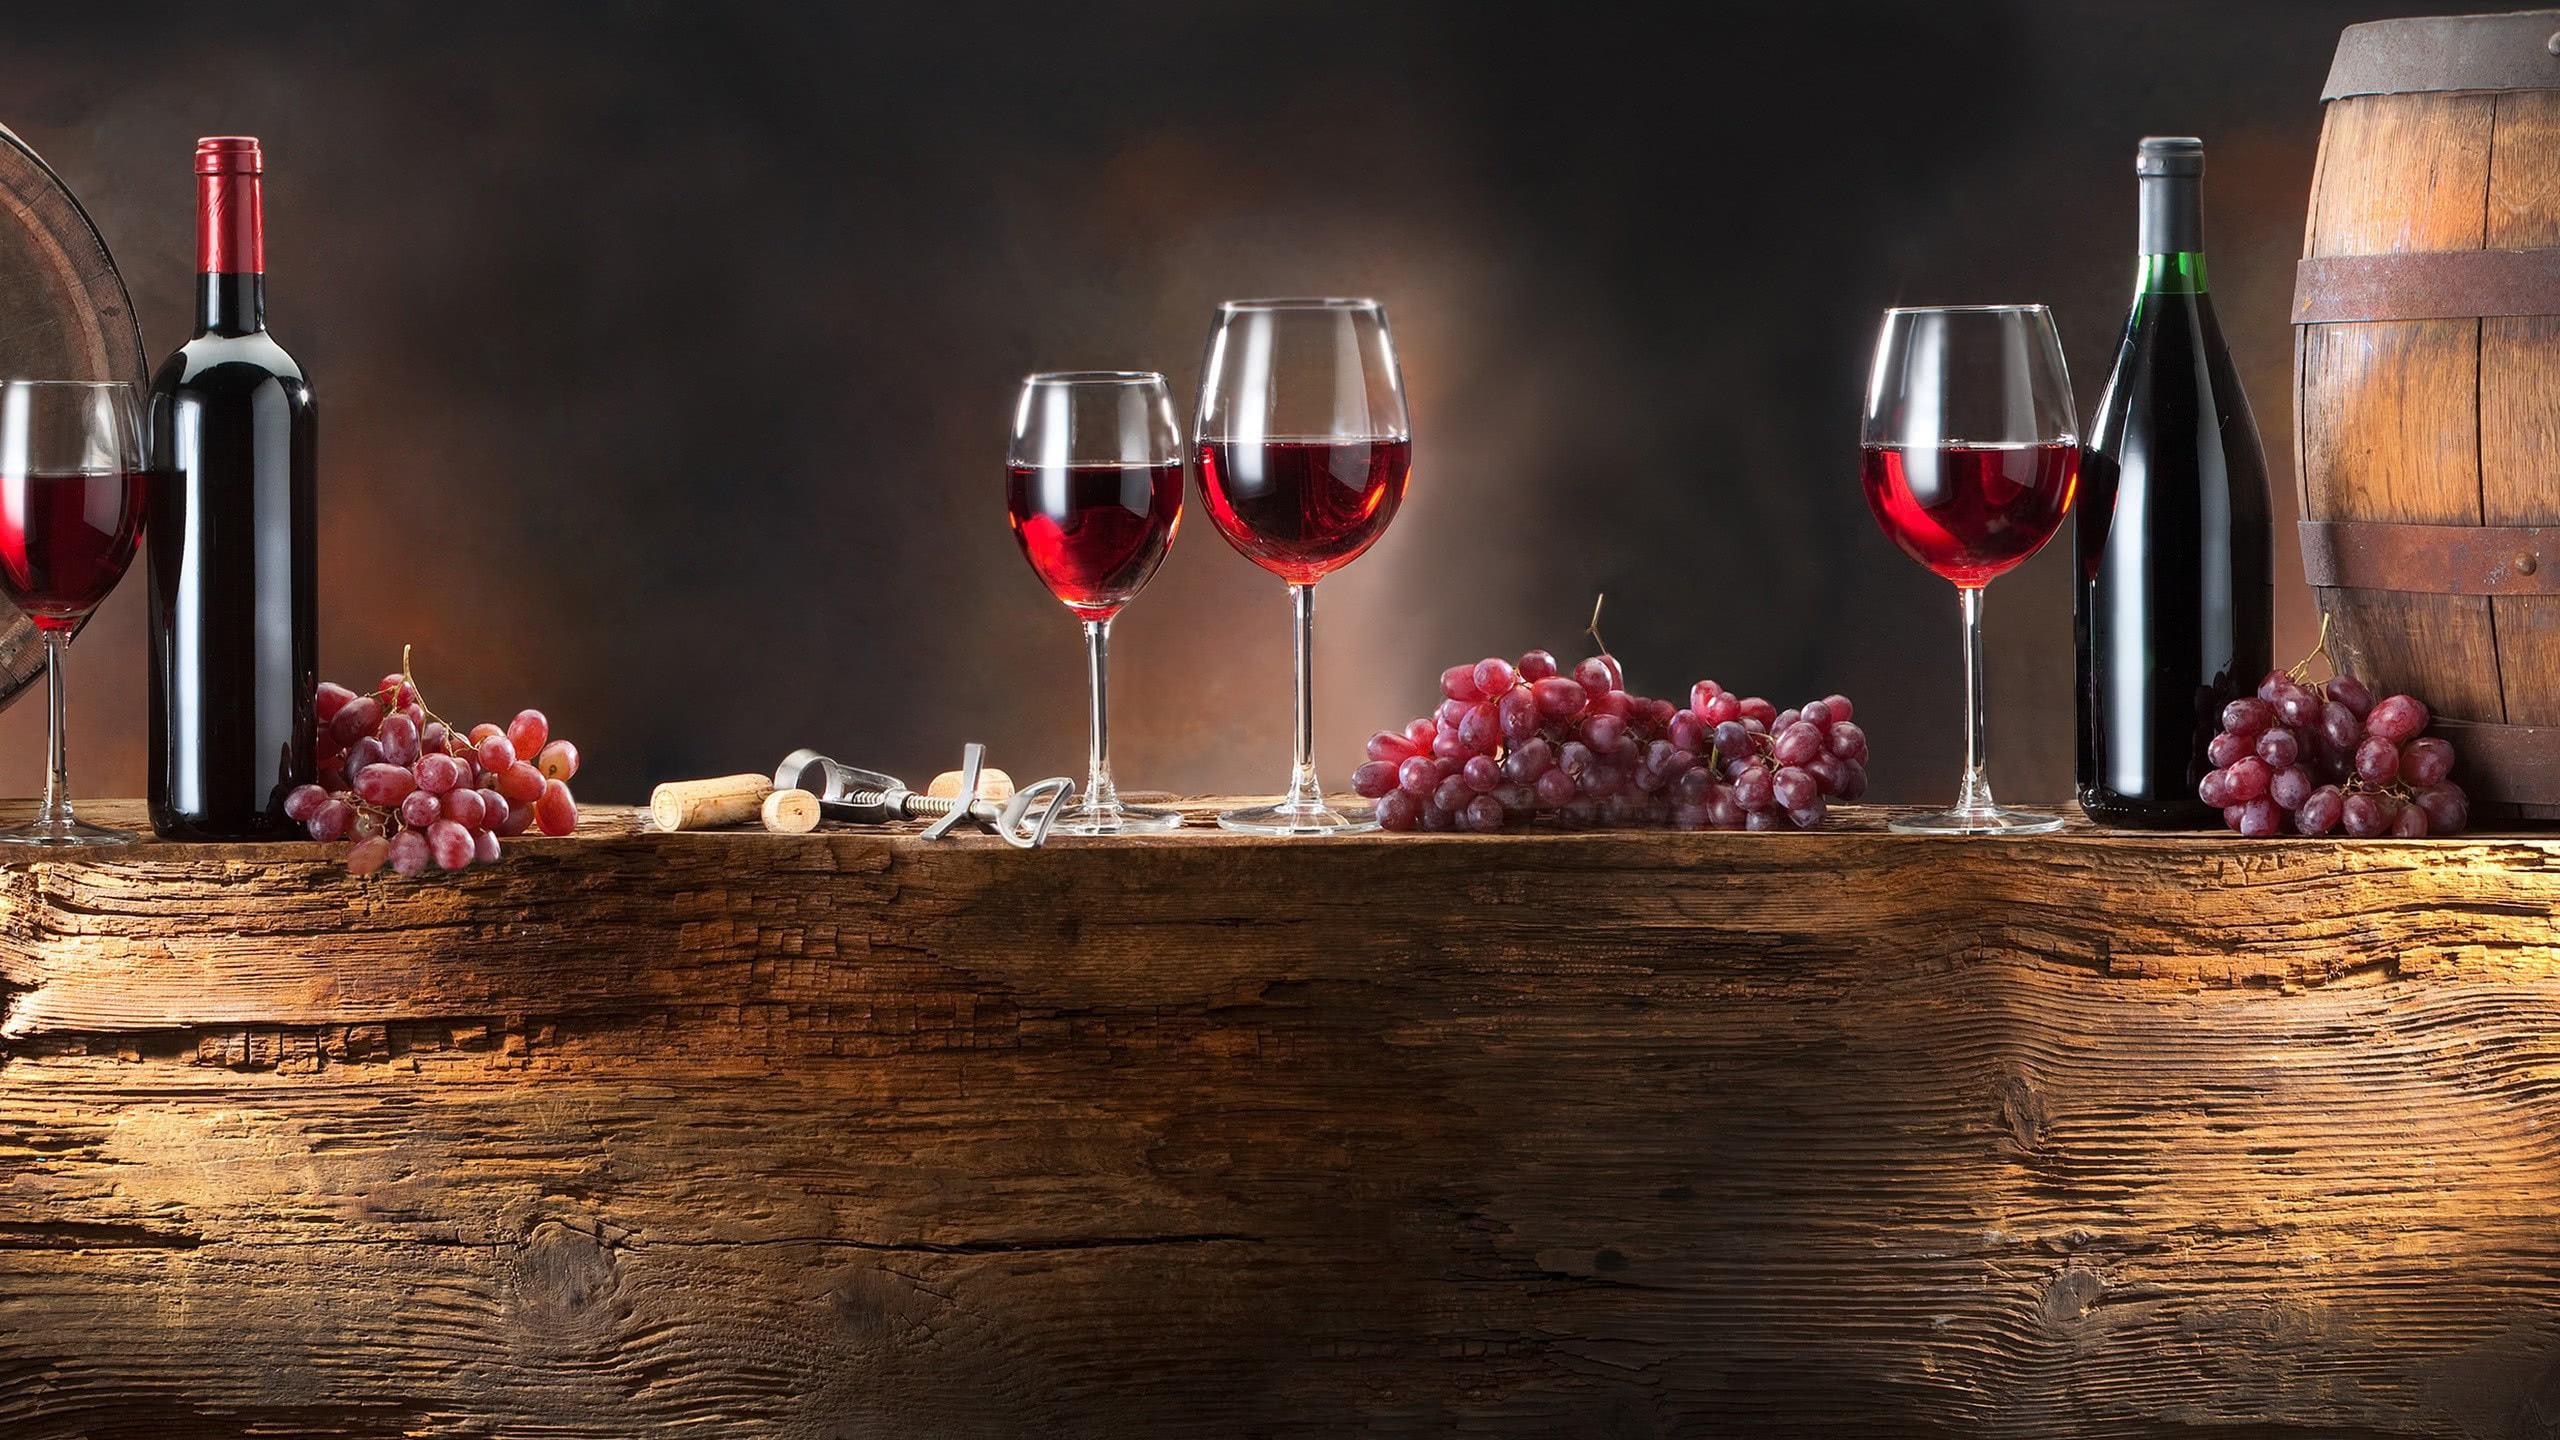 wine glasses wqhd 1440p wallpaper